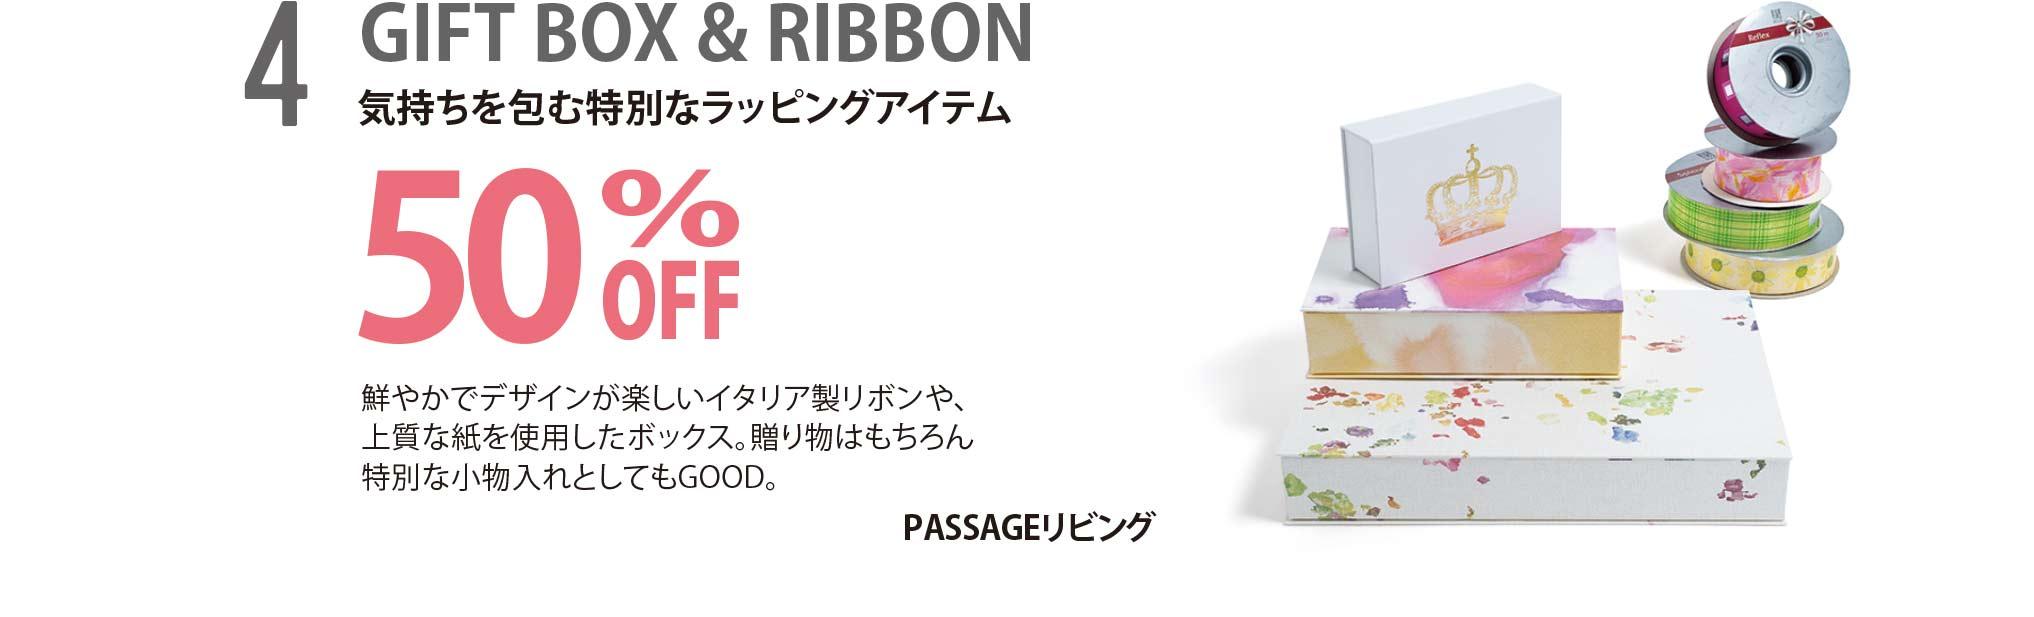 GIFT BOX & RIBBON 50%OFF 気持ちを包む特別なラッピングアイテム